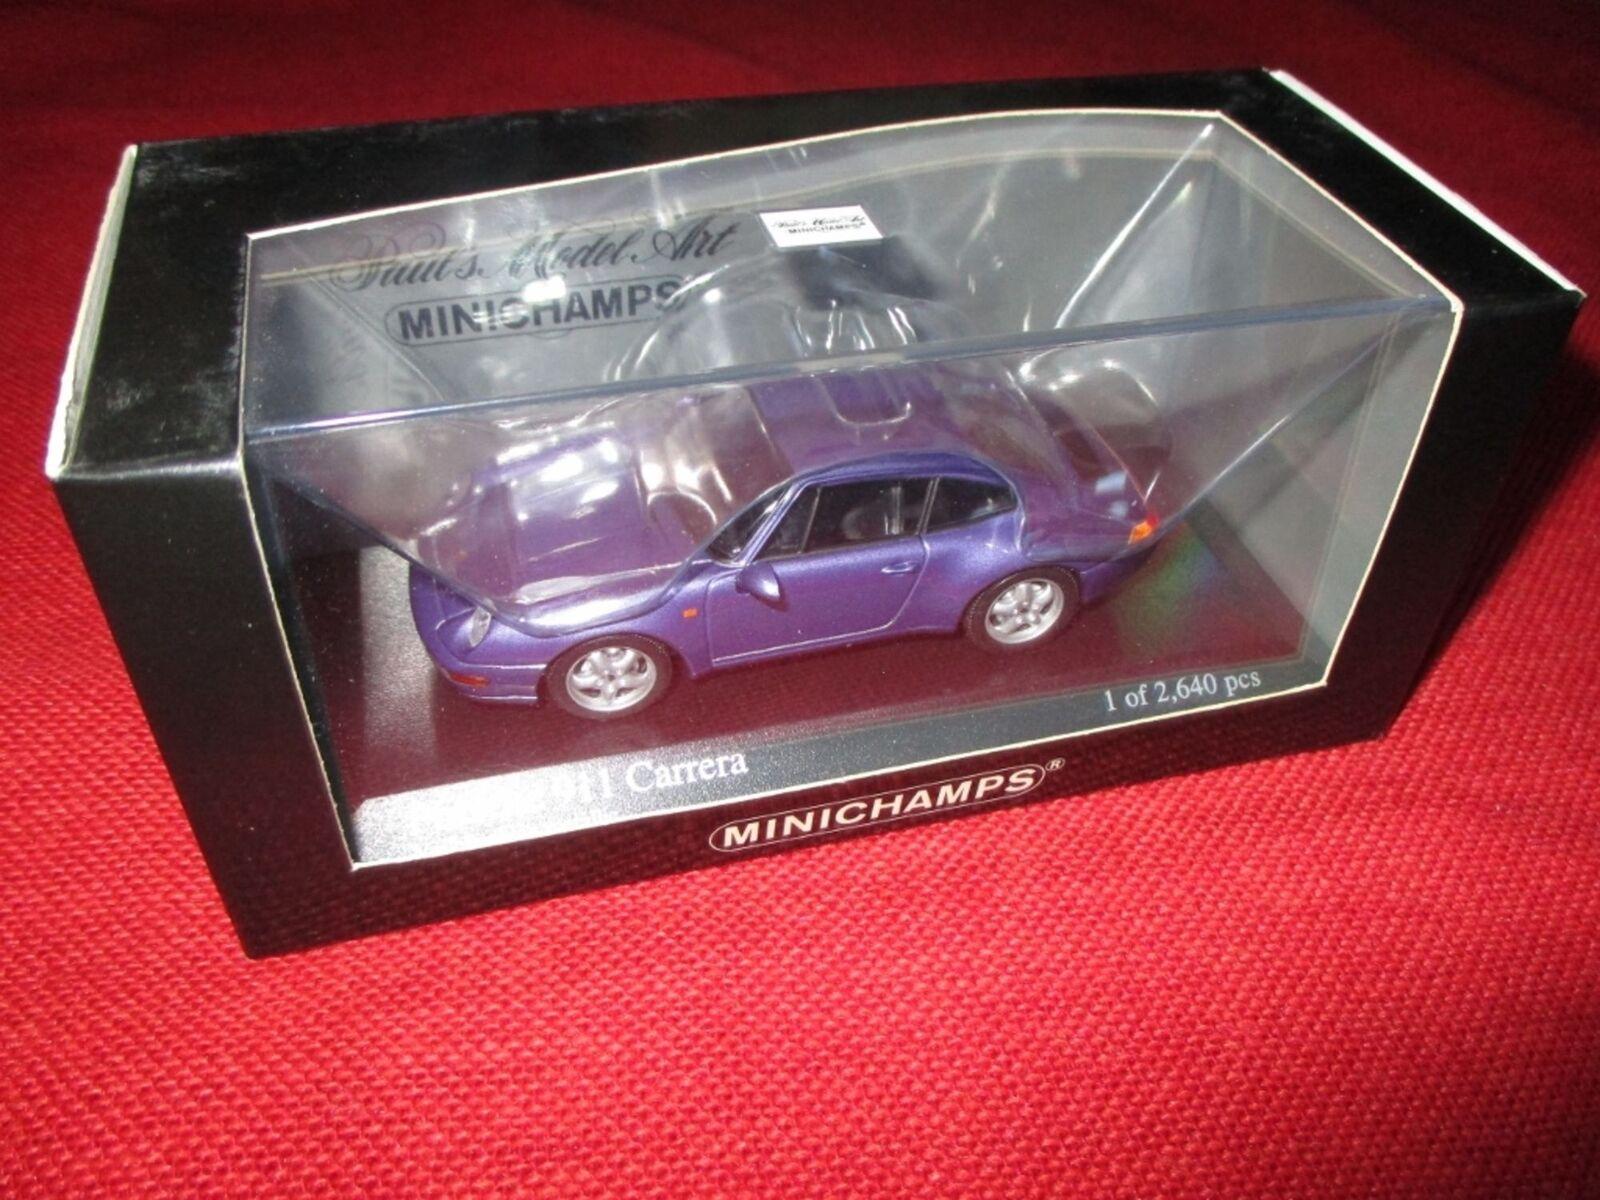 MINICHAMPS ® 430 063011 1 43 Porsche 911 1993 violet Metallic neuf neuf dans sa boîte